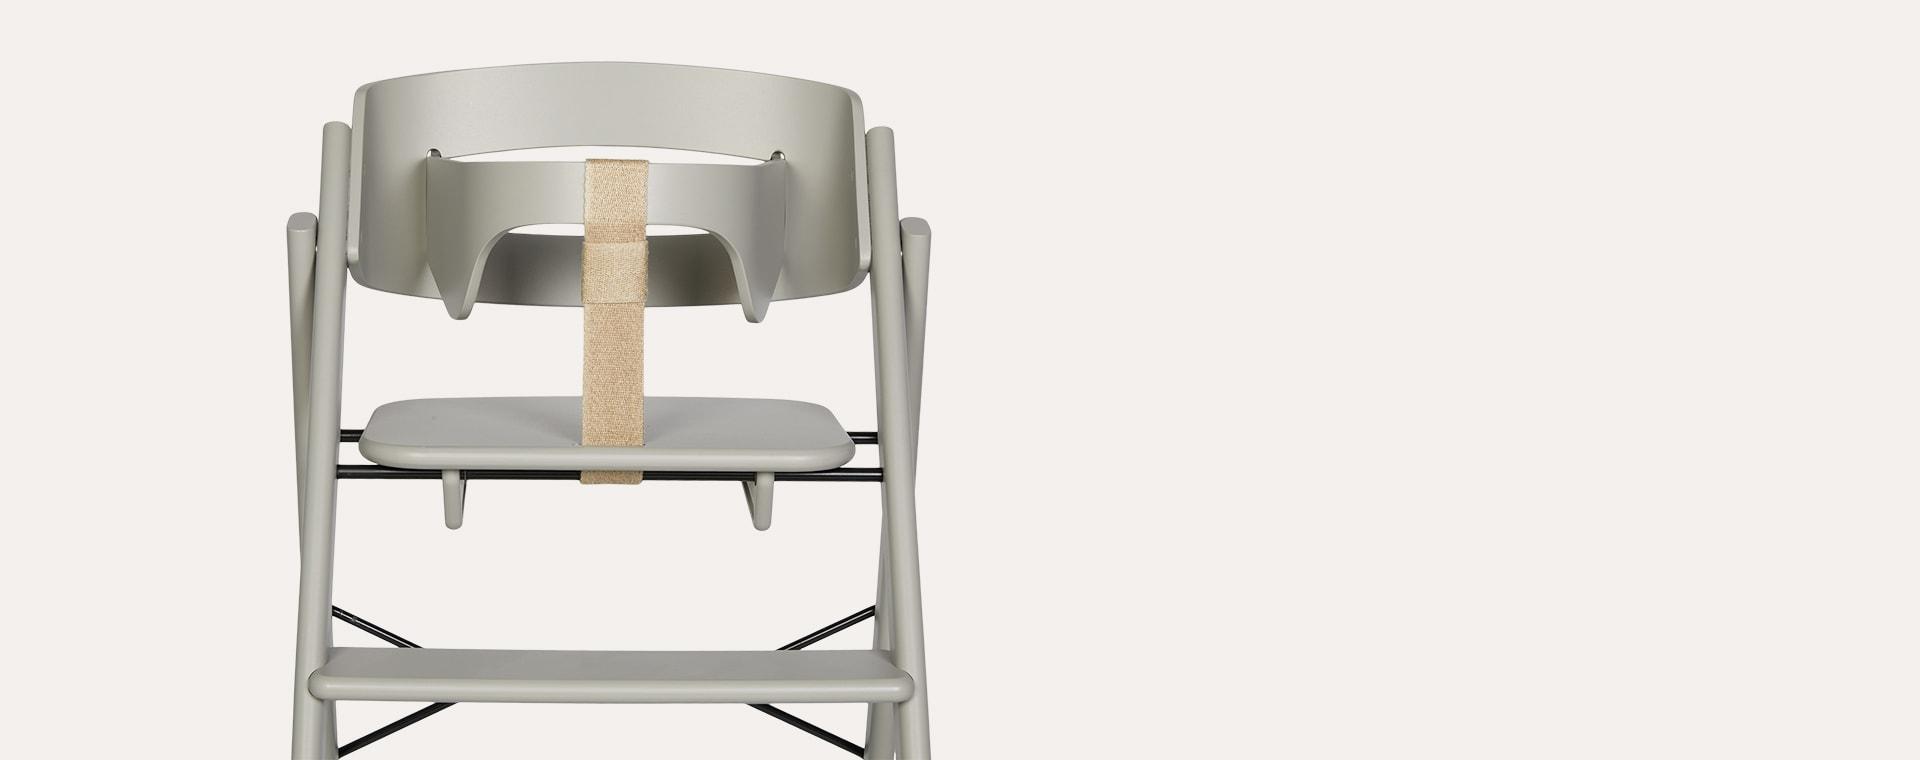 Grey KAOS Klapp Foldable Highchair With Safety Rail